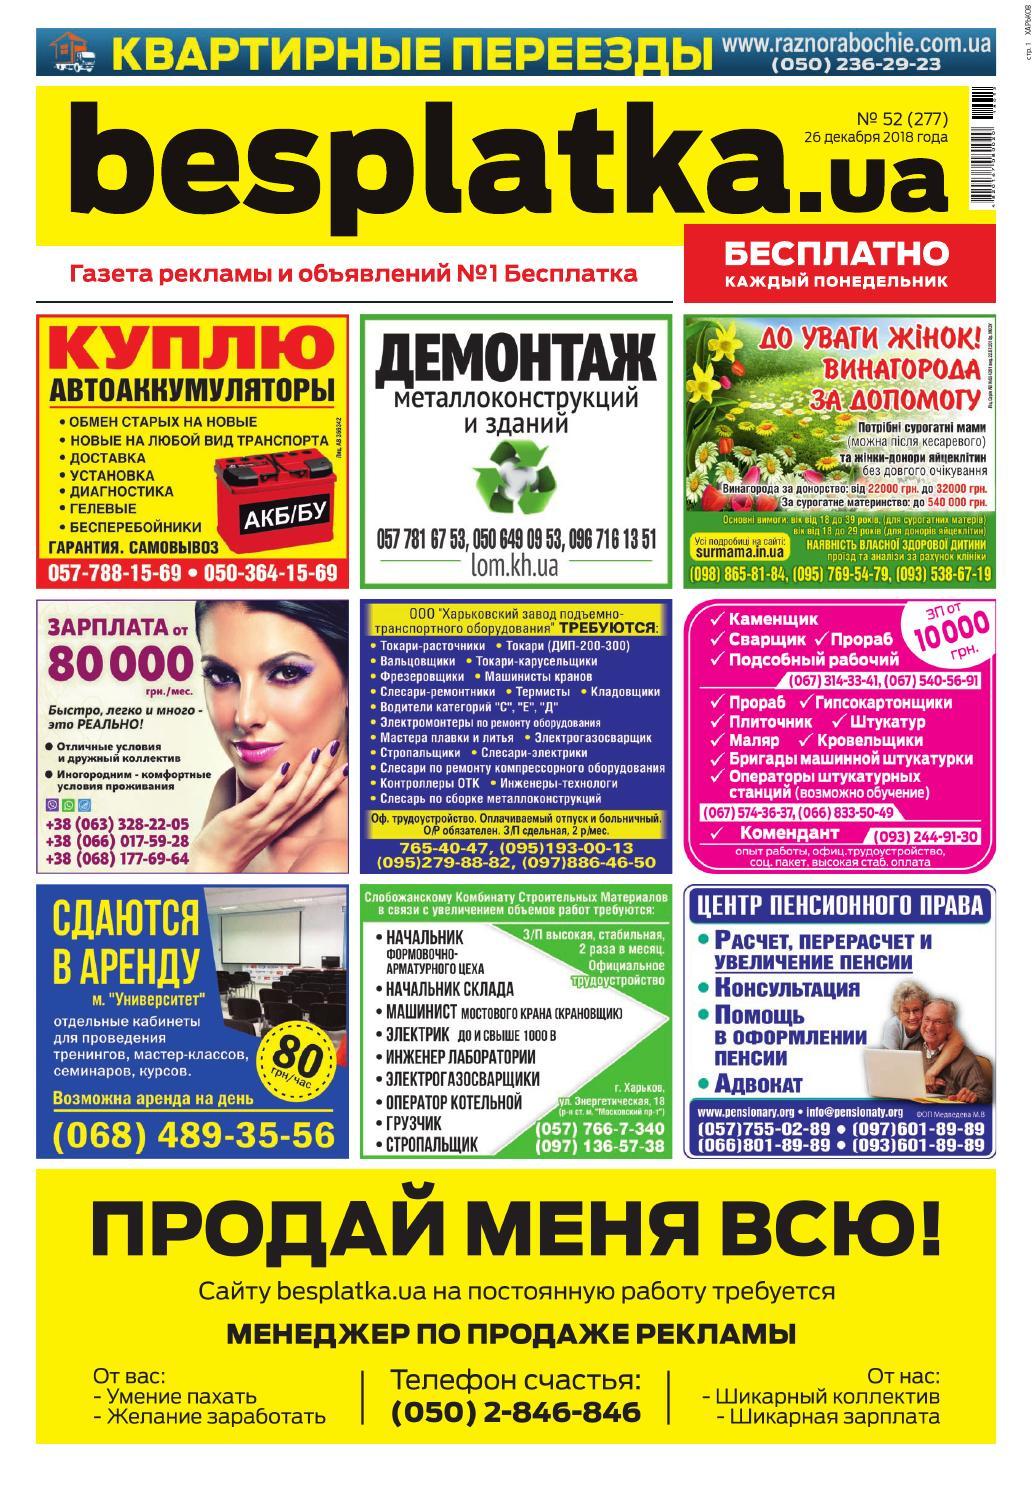 2aa038cc98631 Besplatka #52 Харьков by besplatka ukraine - issuu